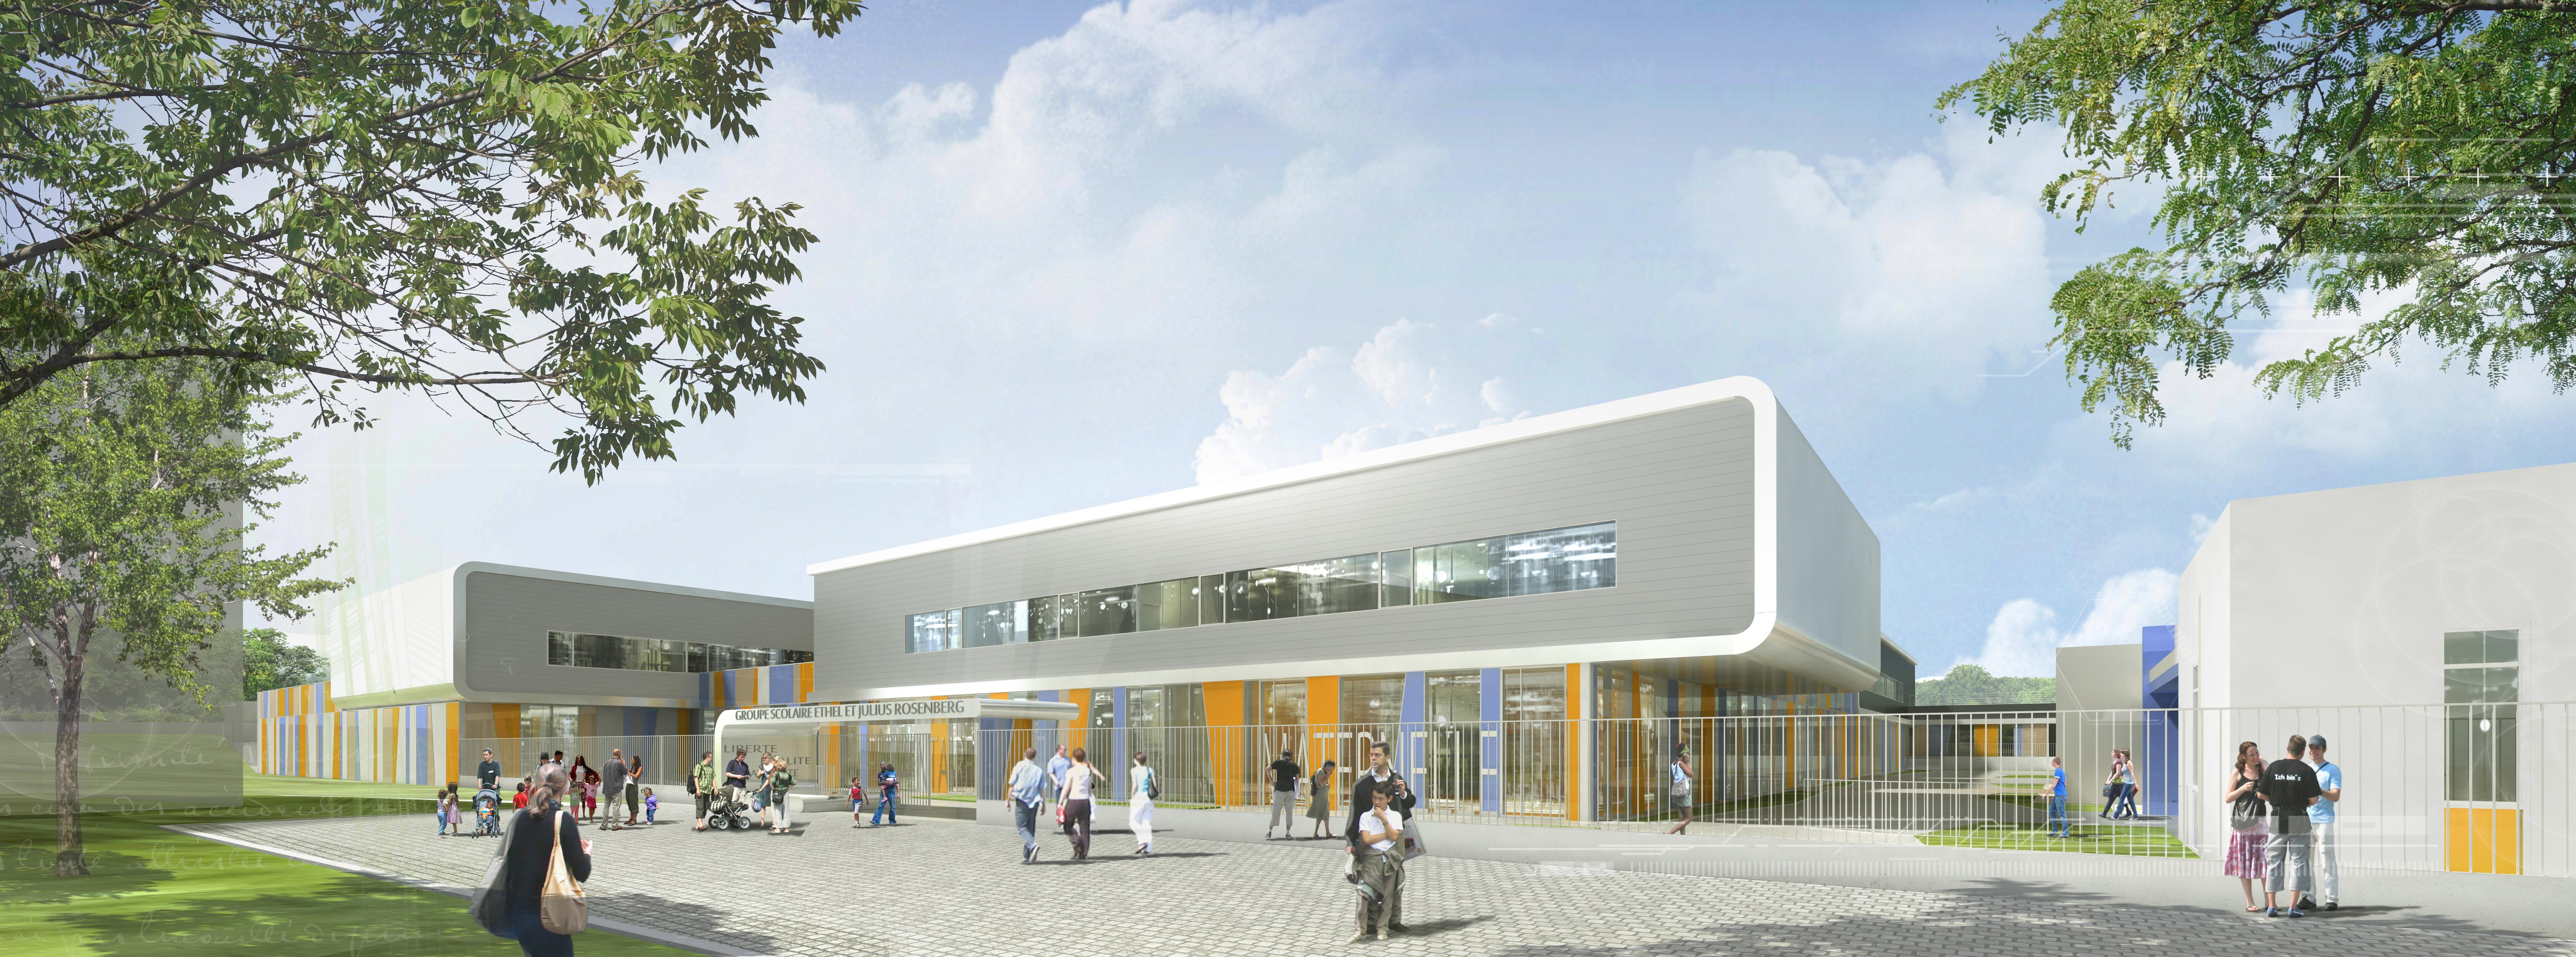 INTERSENS - LEHOUX PHILY & SAMAHA Architectes - Ecole primaire - Lacourneuve